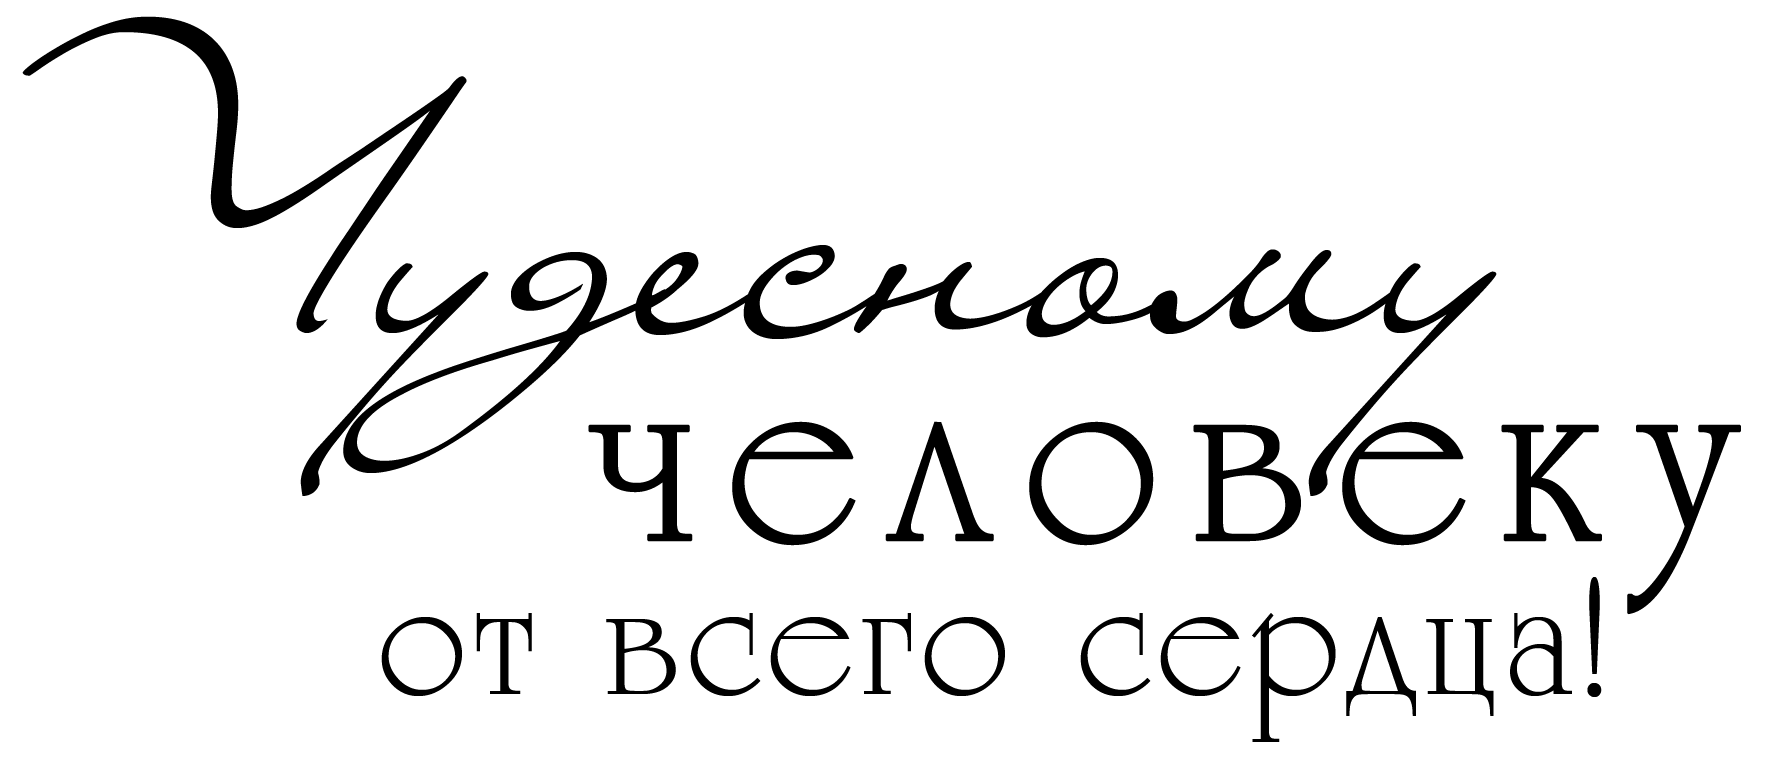 3b19e610e0b6.png (1772×774)